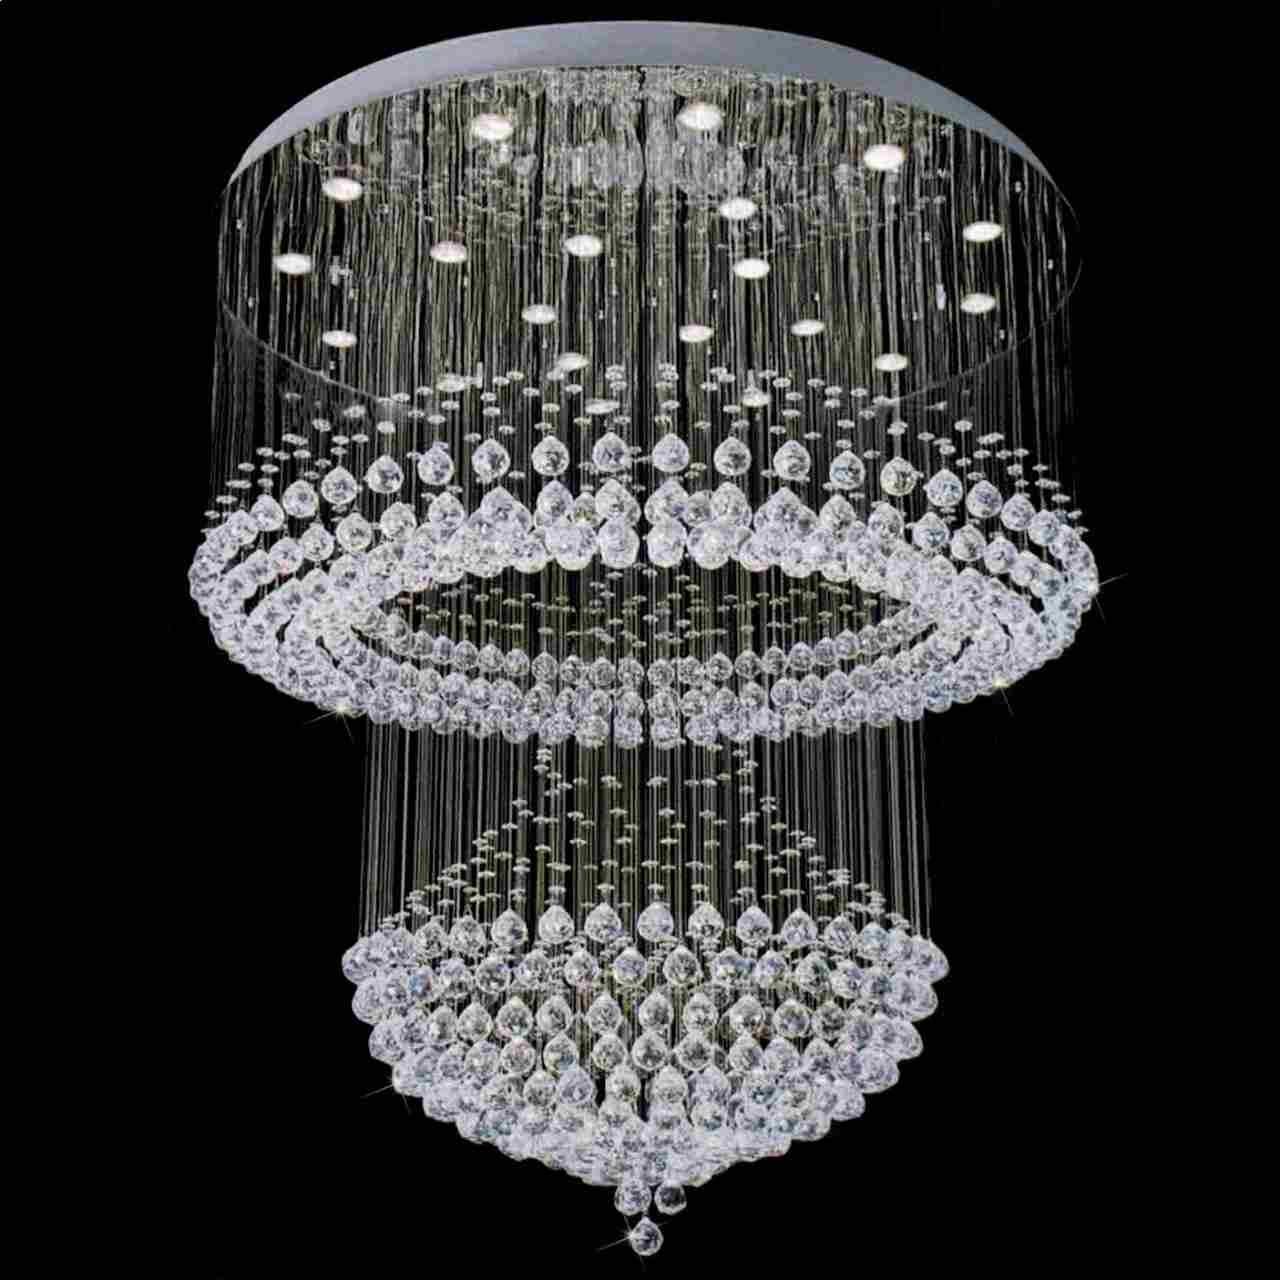 Vienna Crystal Chandeliers Regarding Widely Used Home Design : Mesmerizing Modern Crystal Chandeliers Innovative (Gallery 15 of 20)